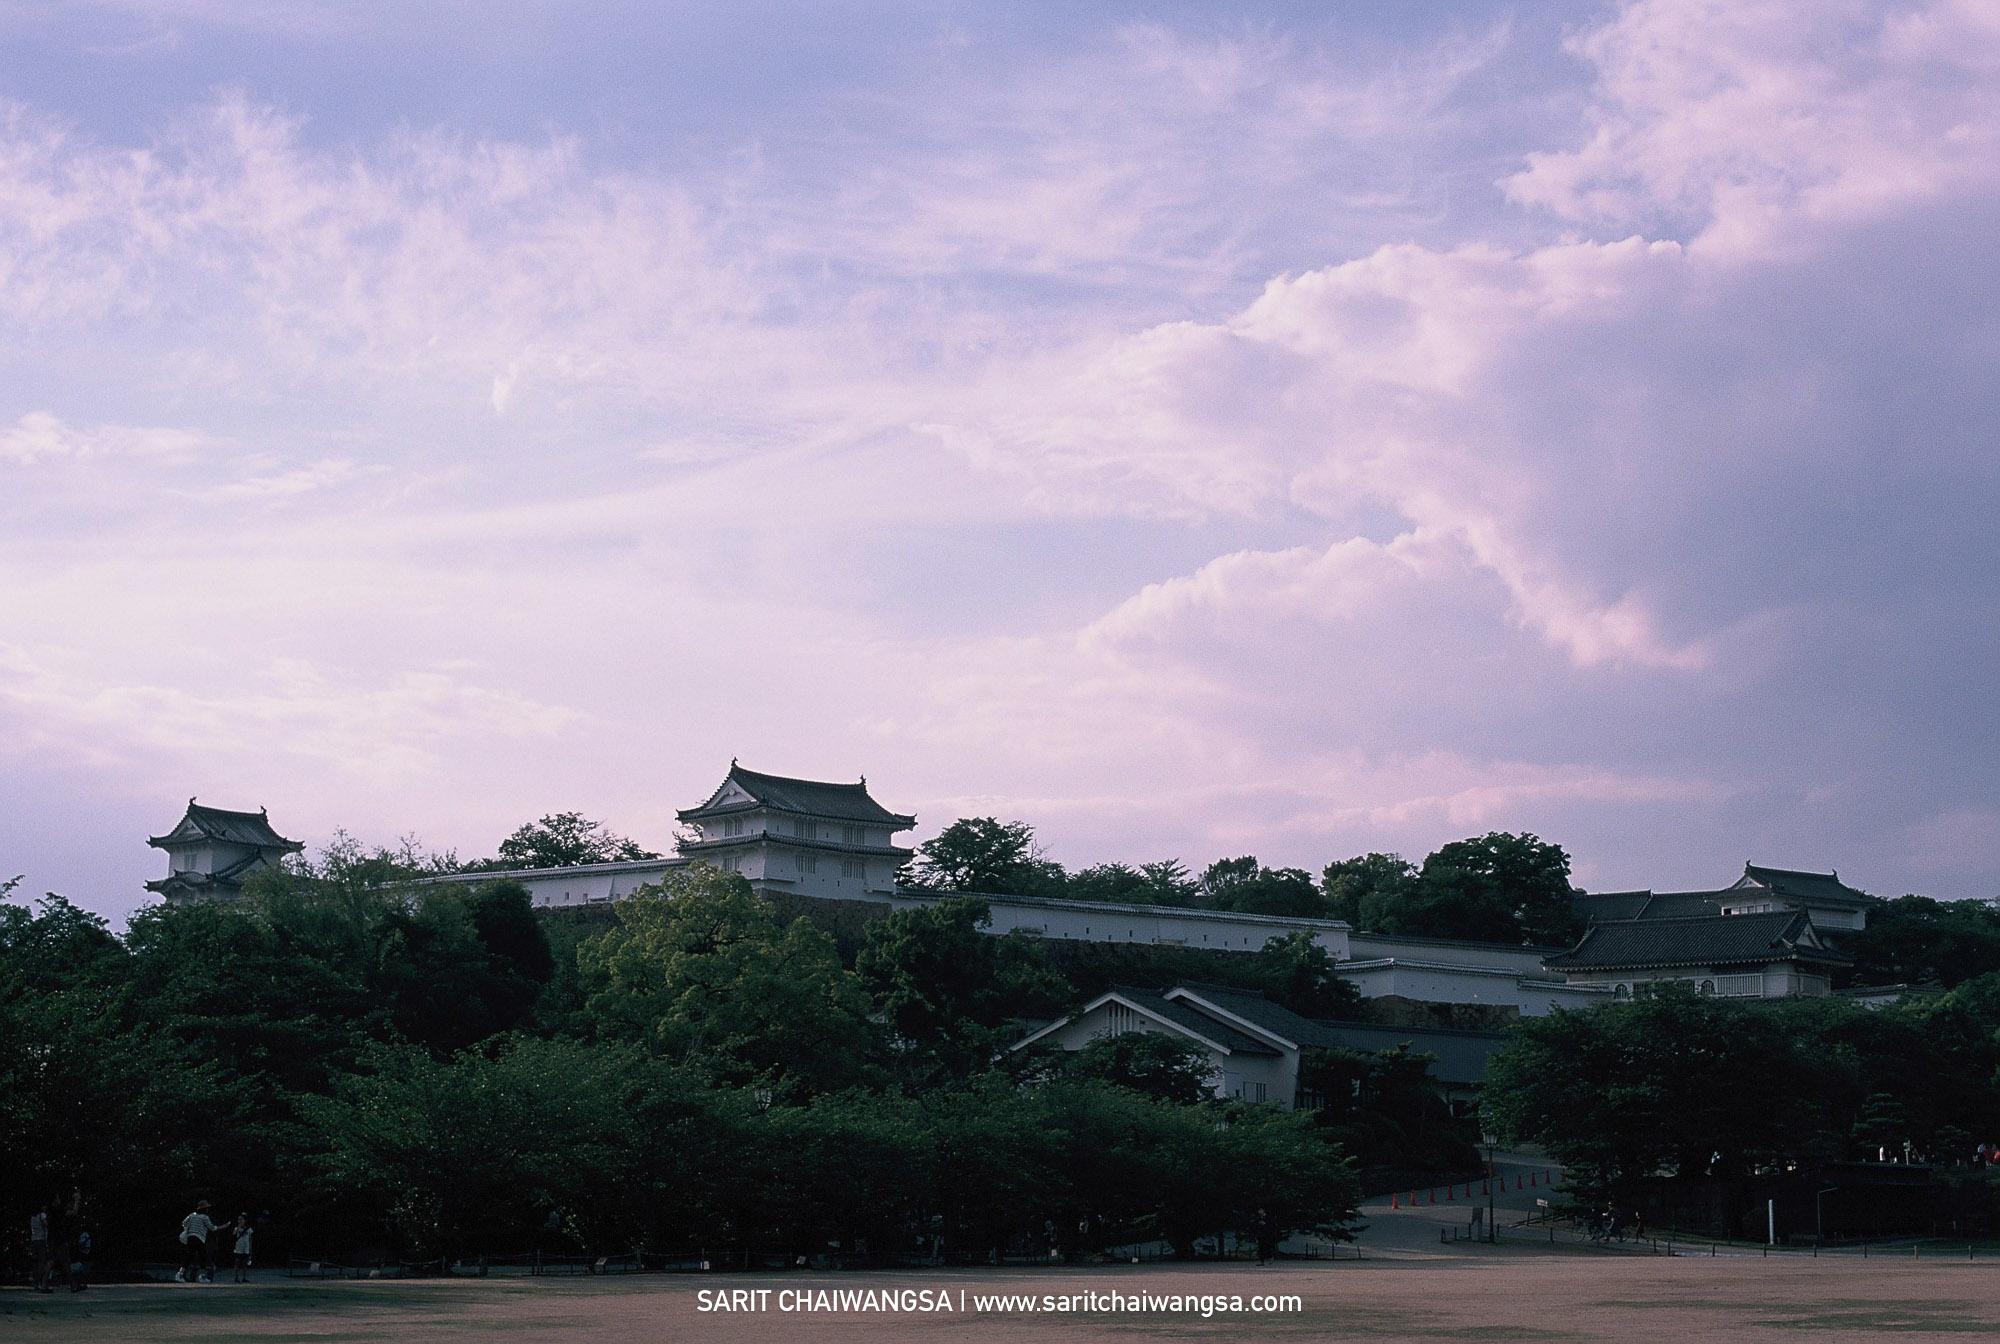 sarit chaiwangsa minolta srt 101 agfa photo himeji castle 15